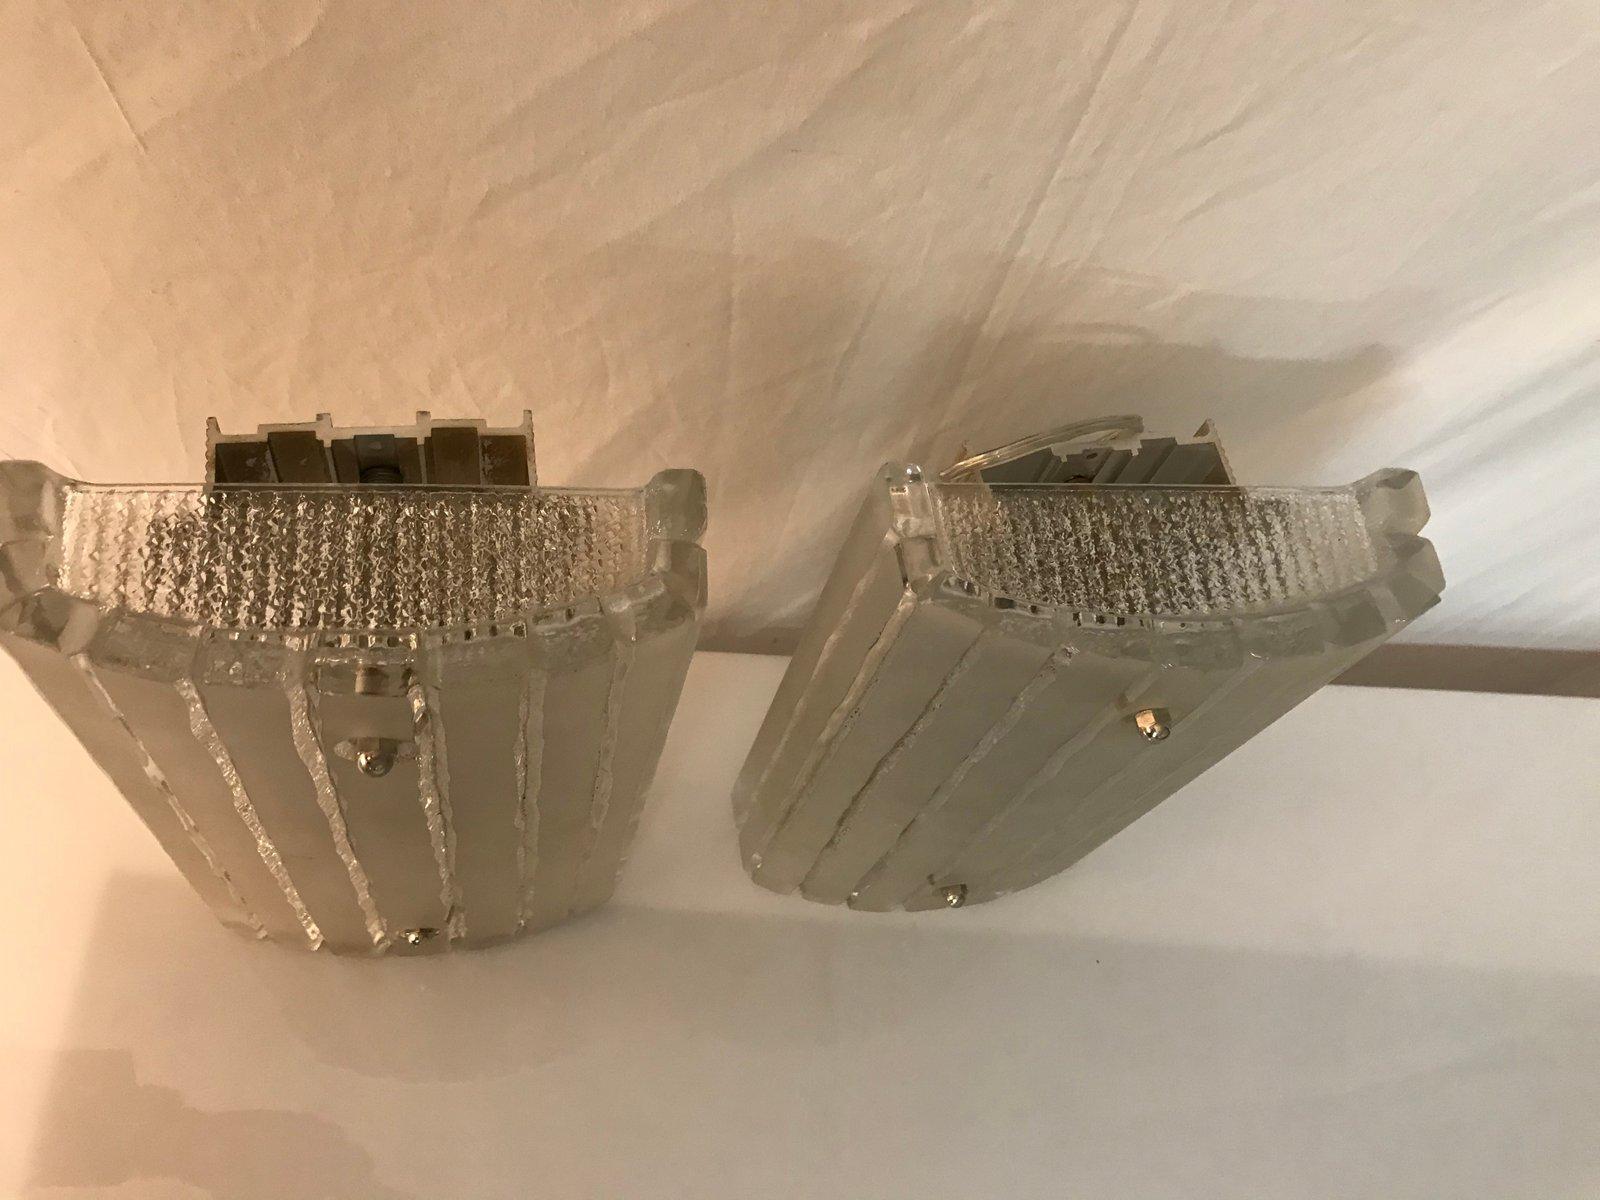 Lampade da parete mid century moderne italia set di 2 in vendita